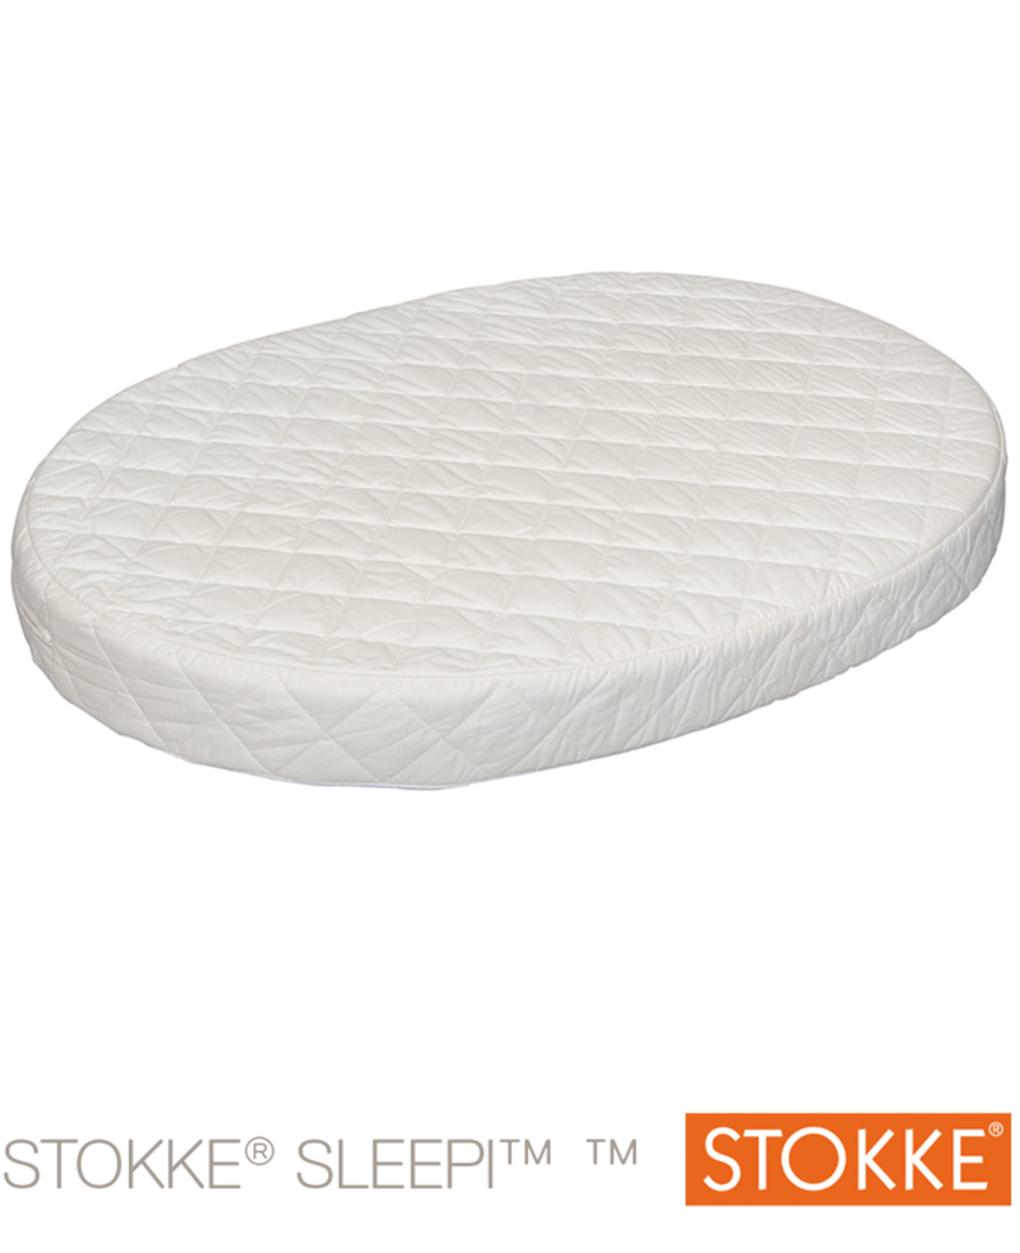 Stokke® sleepi™ materasso per letto baby 120cm - Stokke